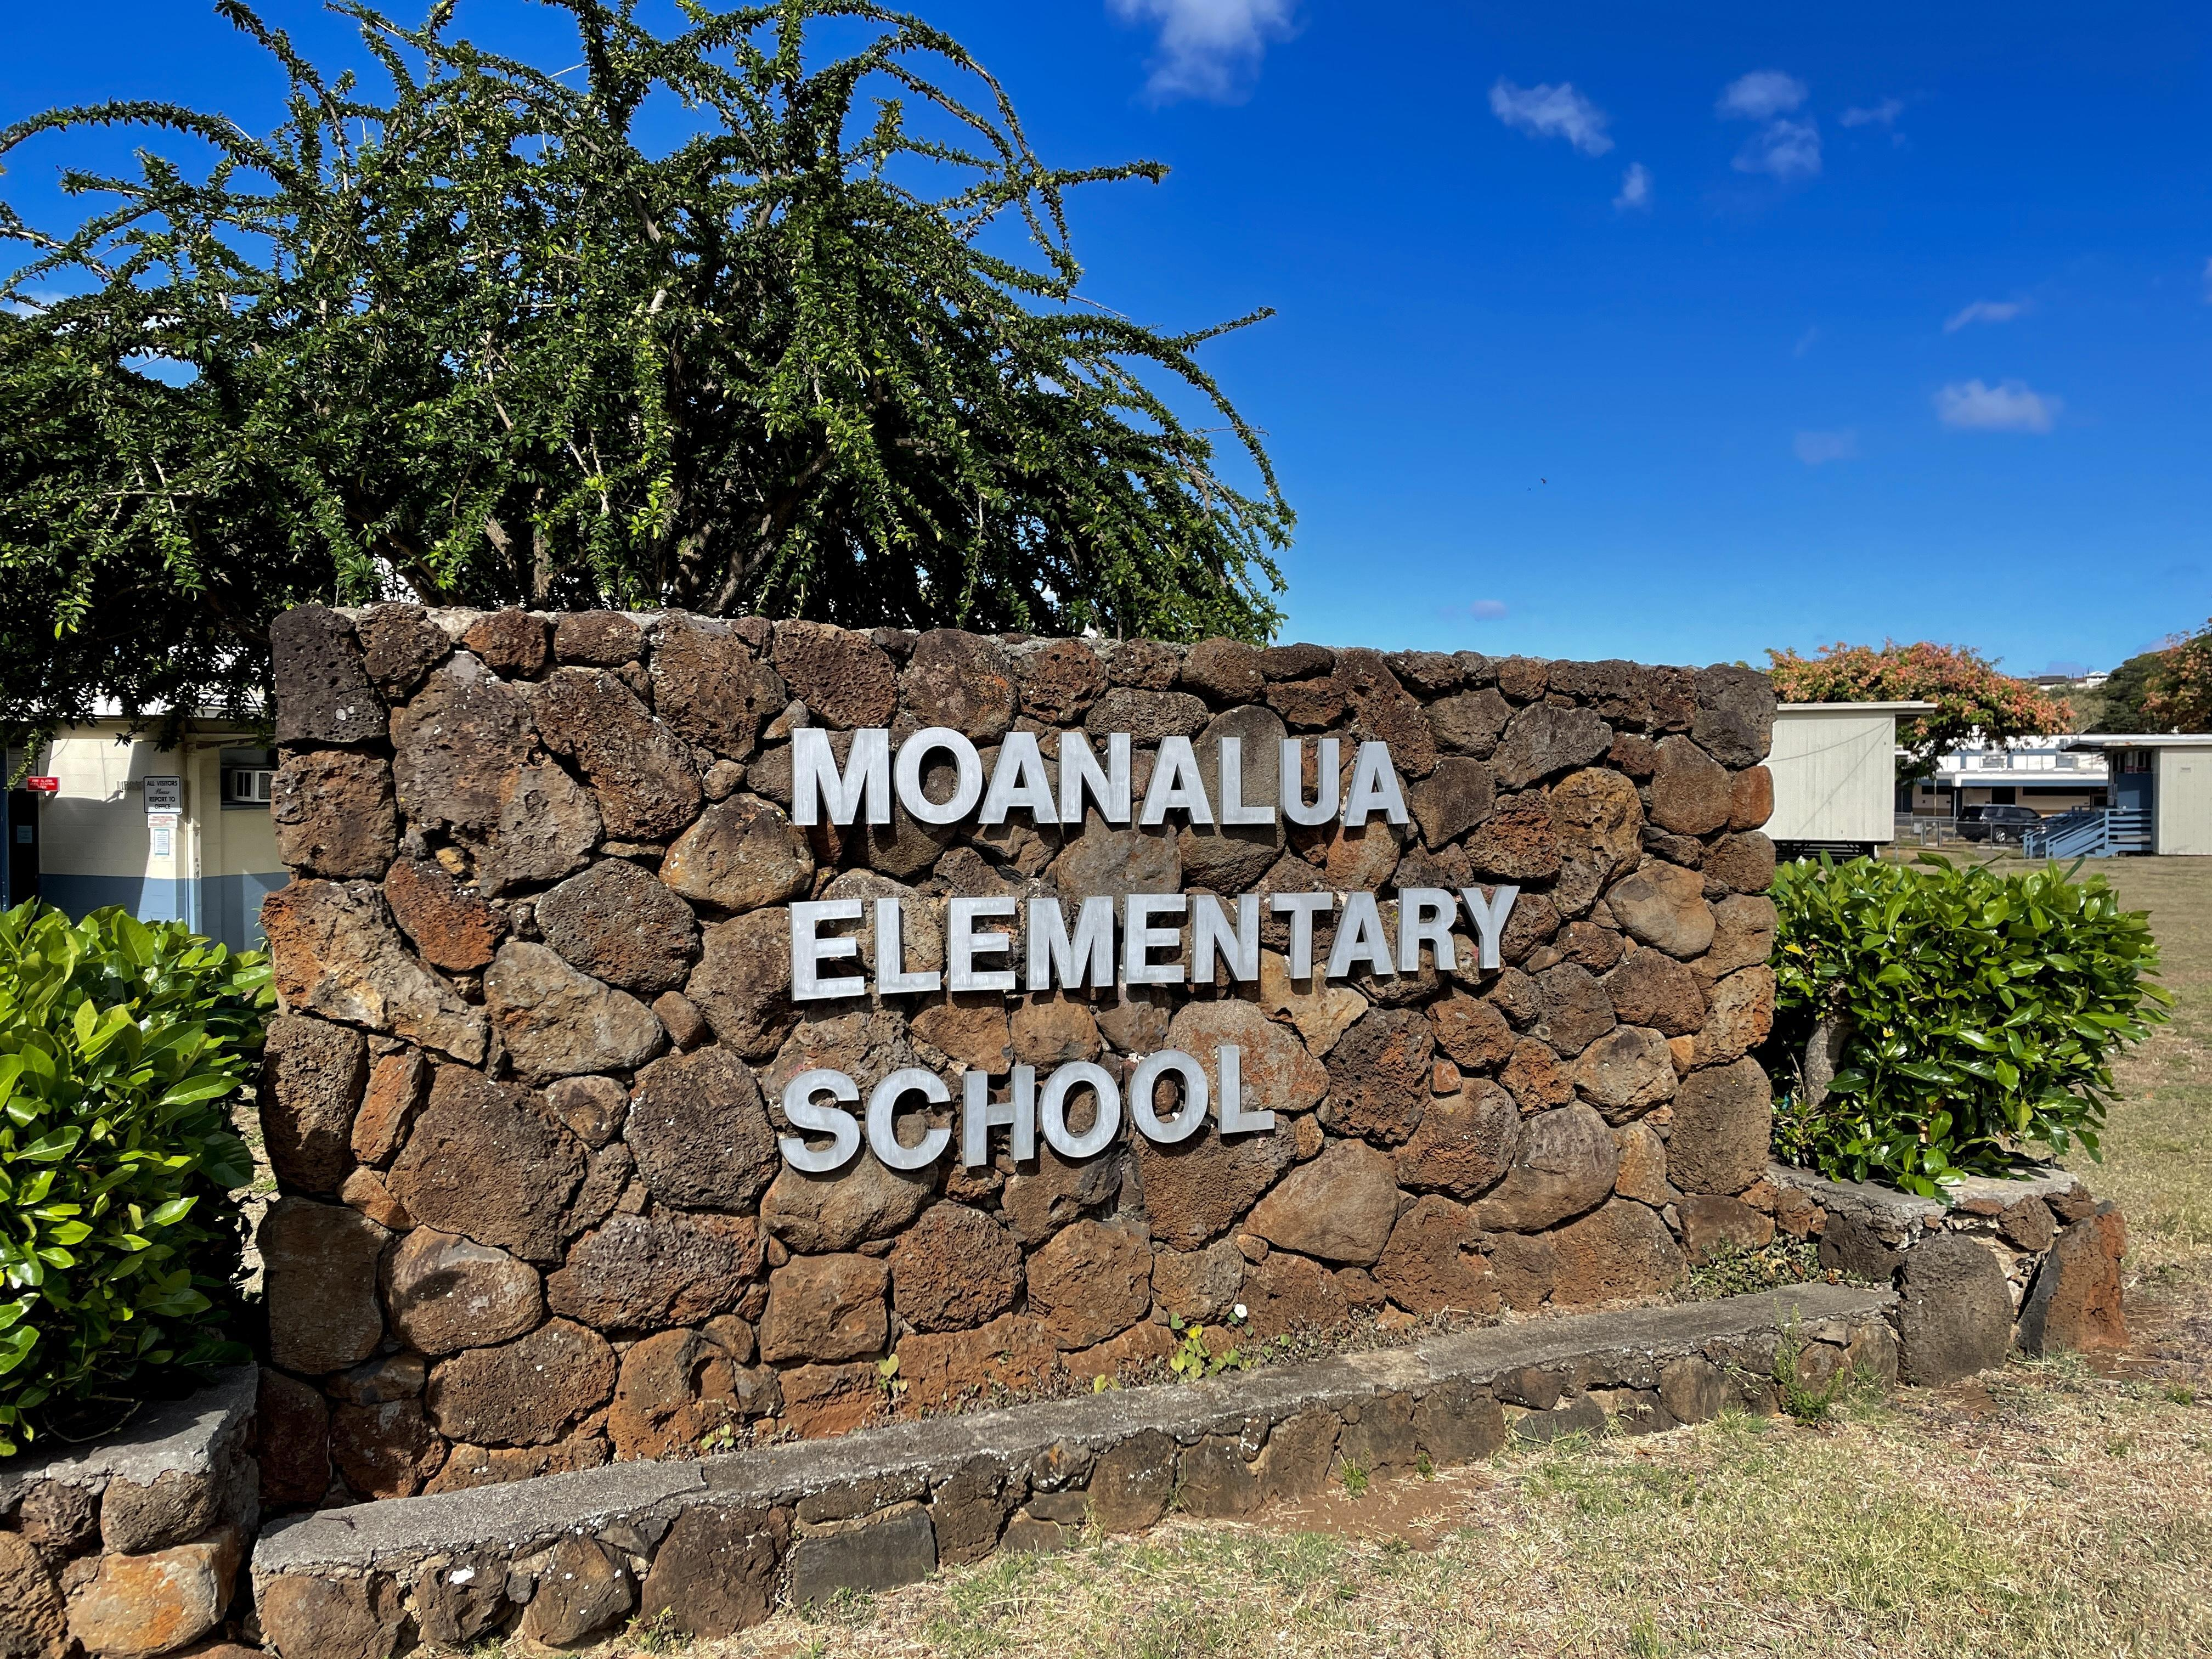 Moanalua Elementary School sign at entrance